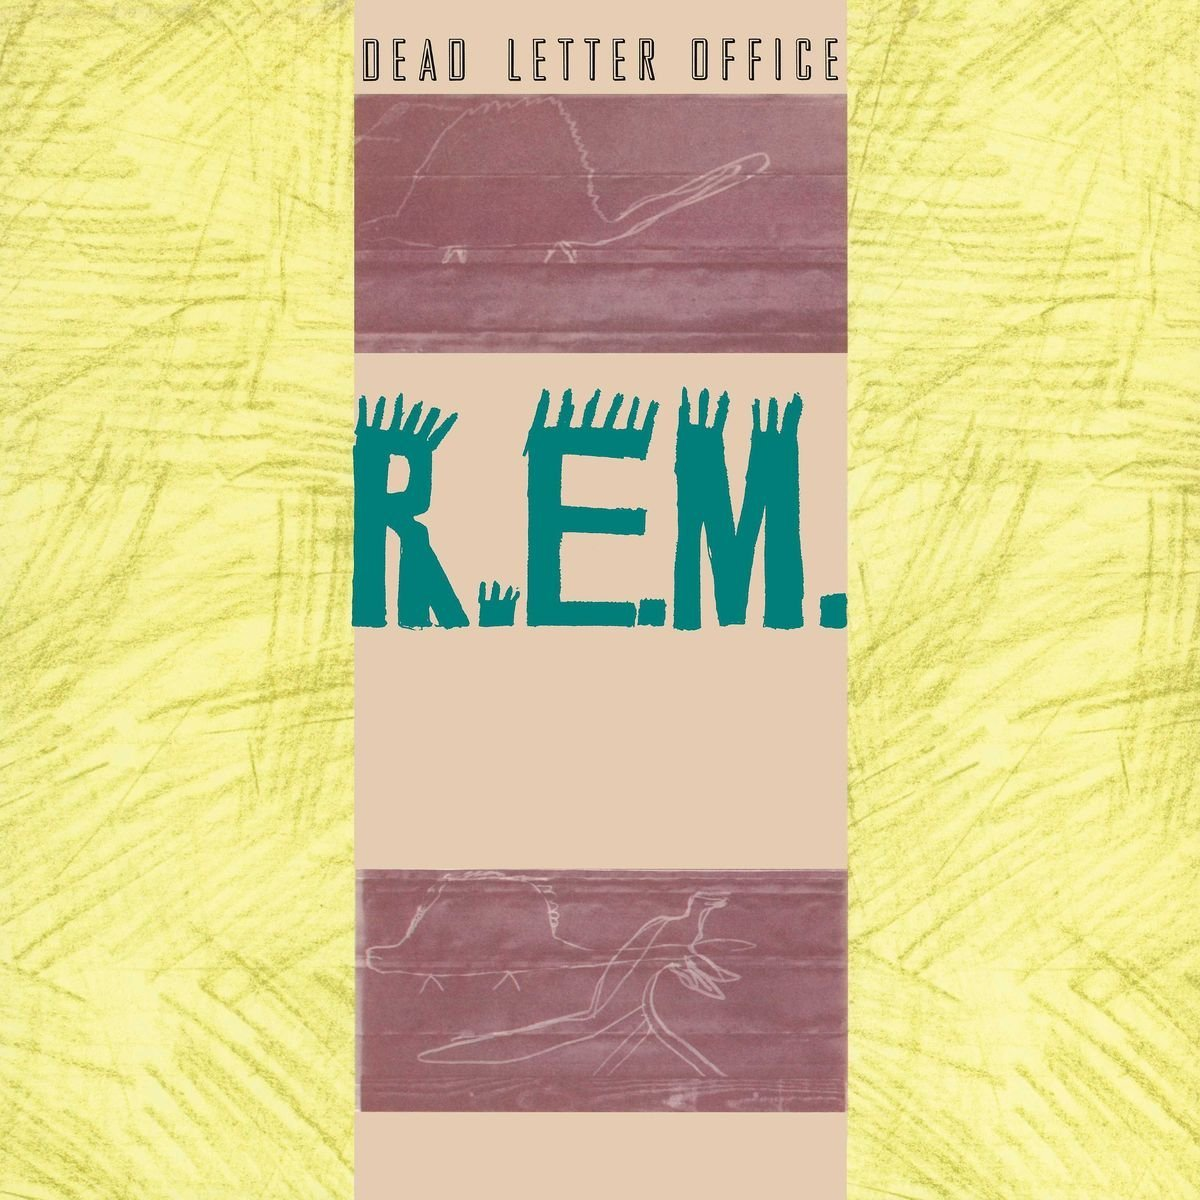 Dead Letter Office Lp Vinili Rem Shop Online 1987